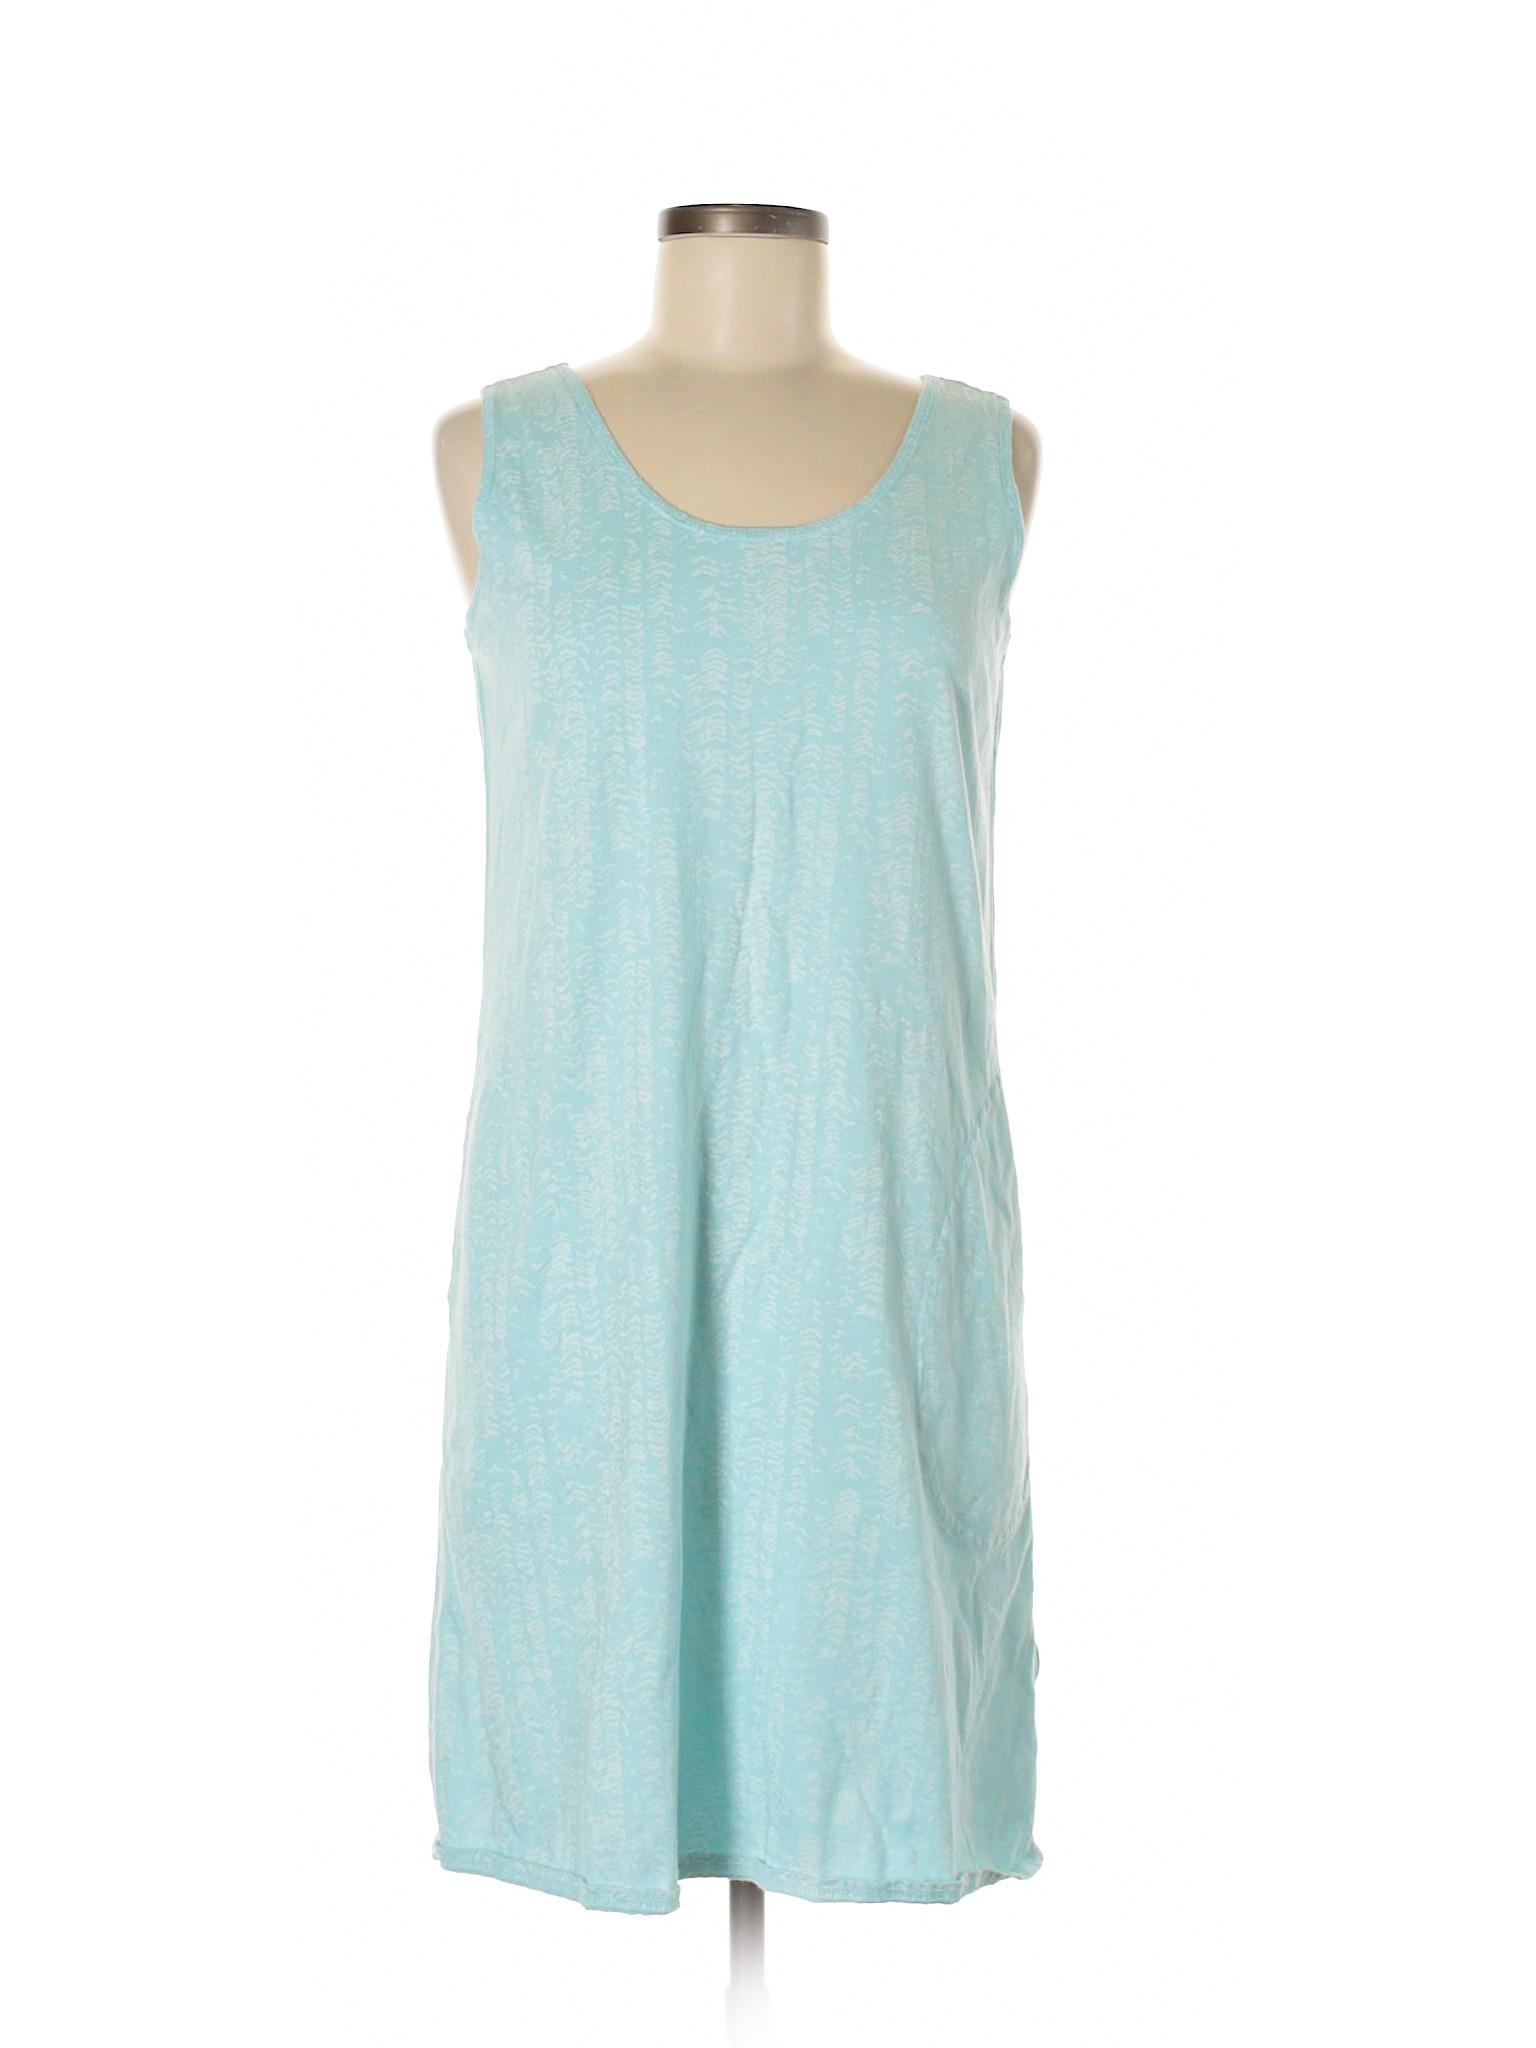 Produce Boutique Dress Casual Fresh winter fWRcc4ZP8